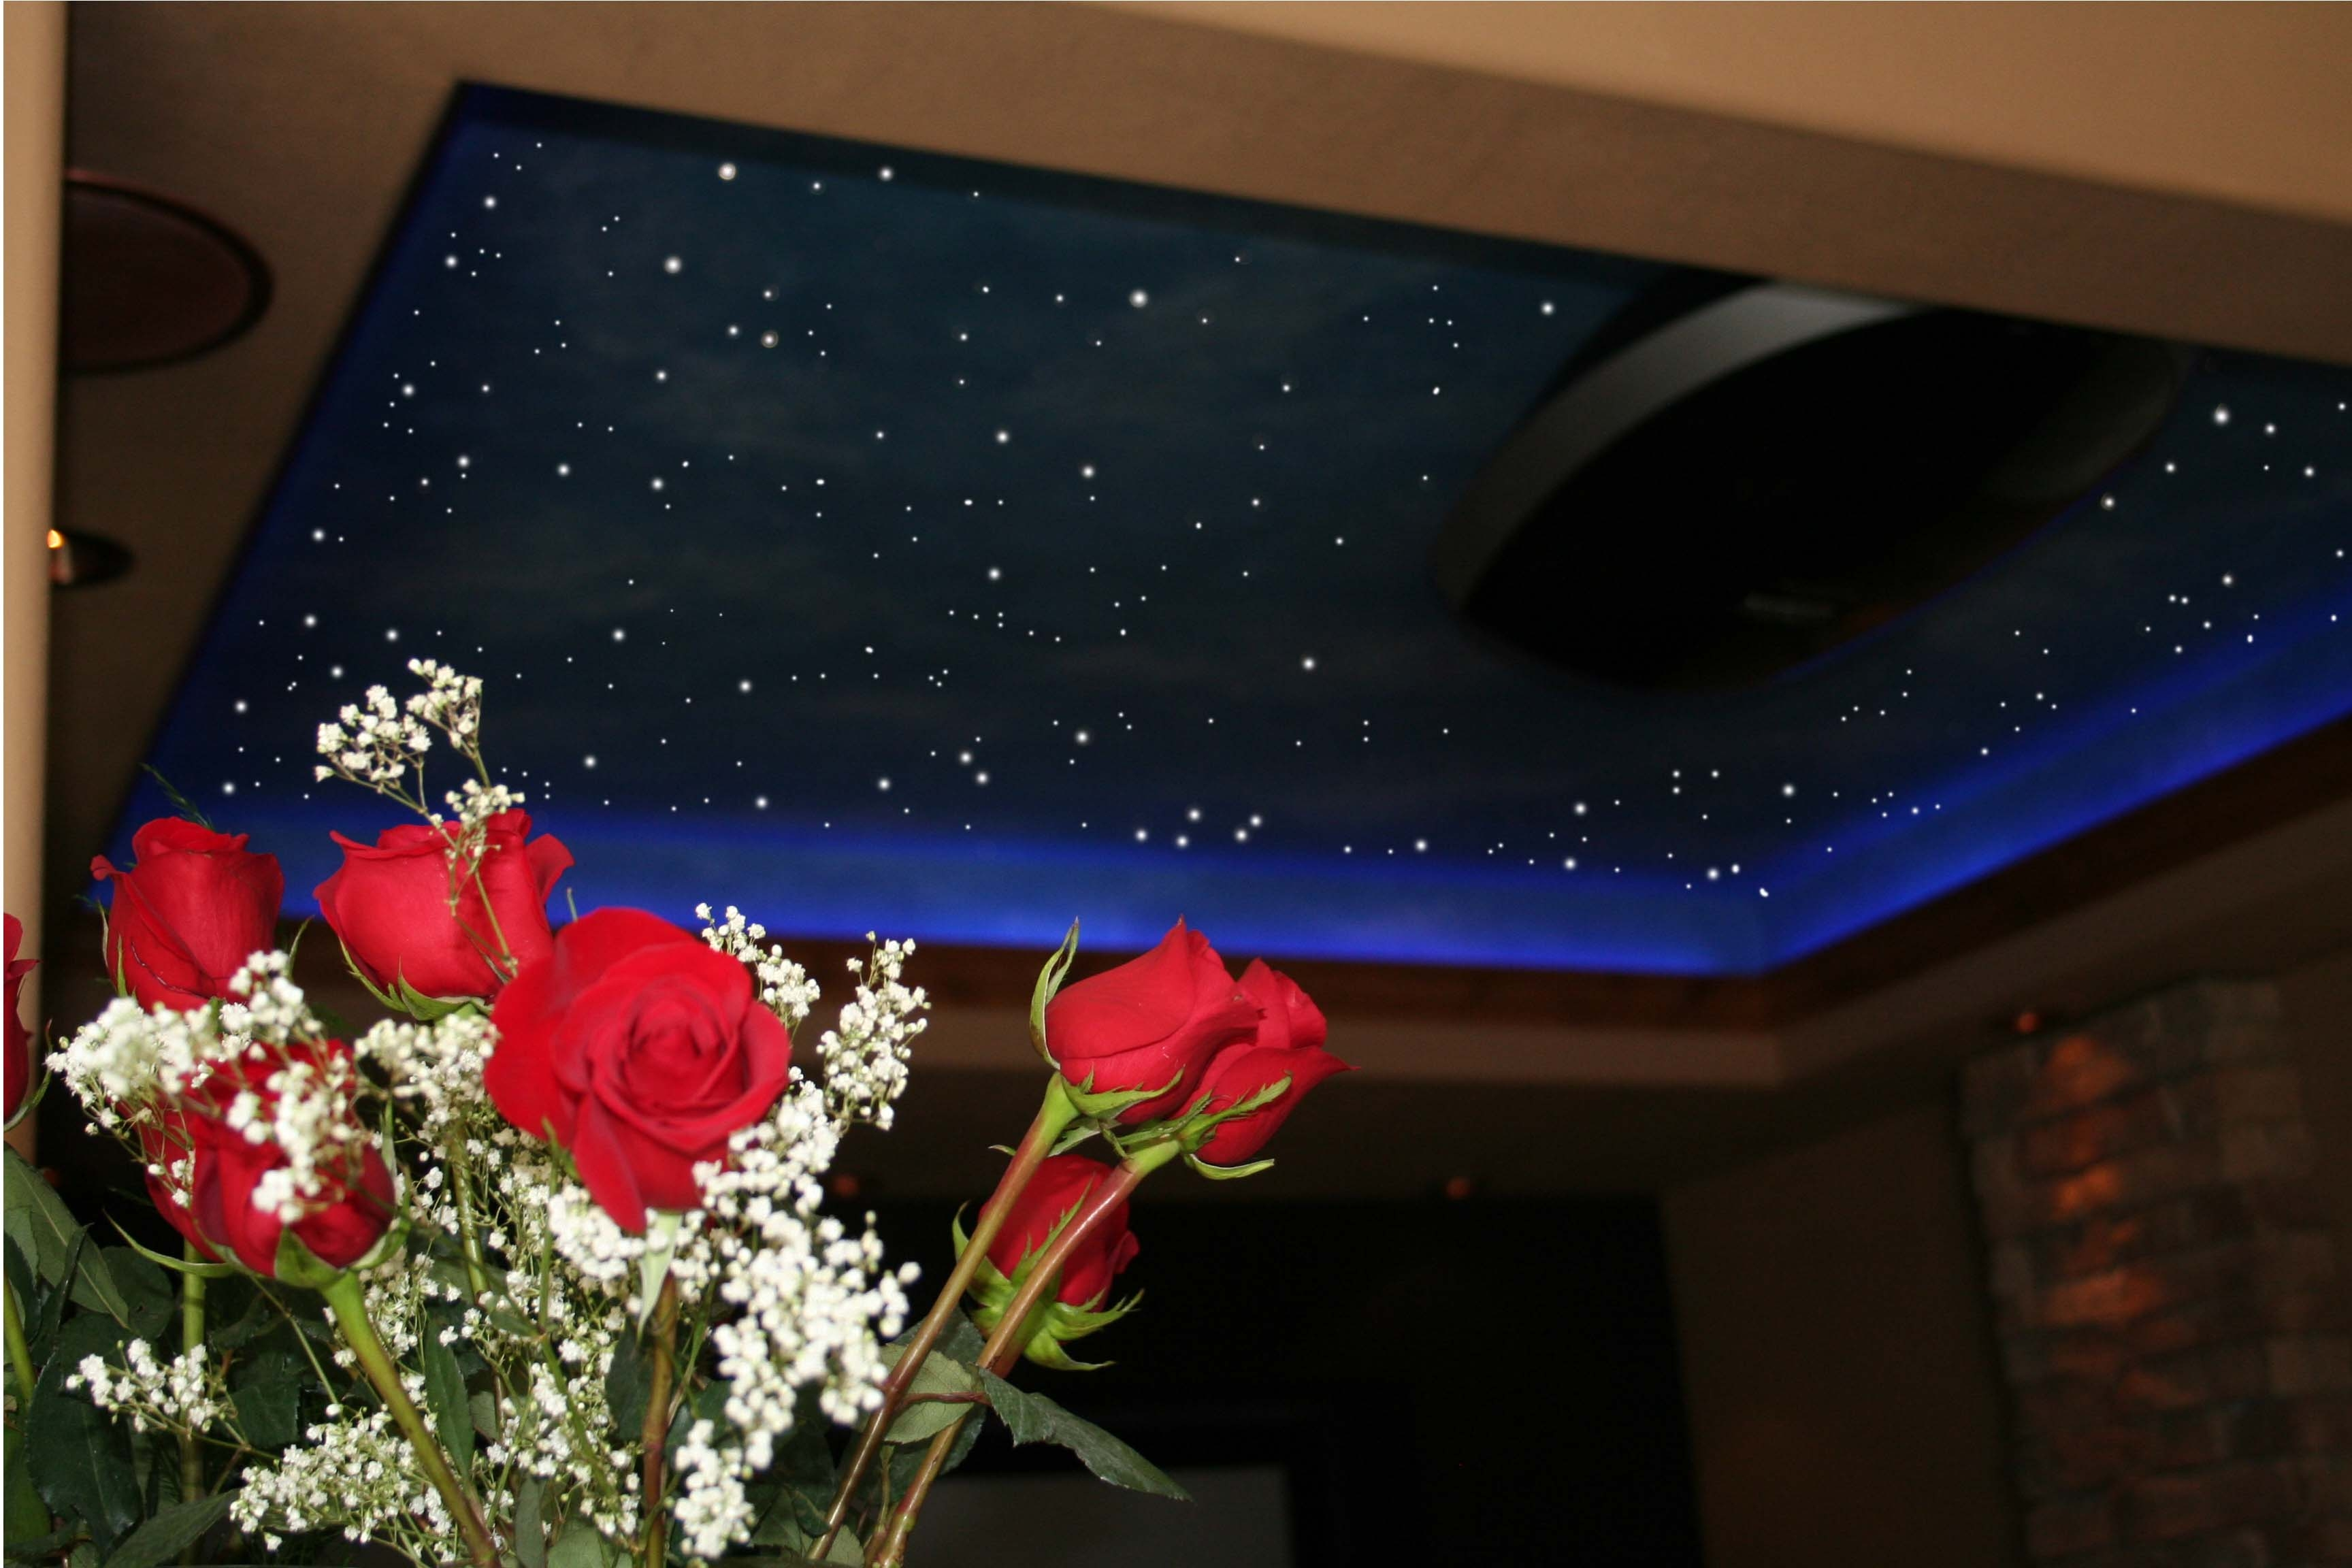 fibre optic star lighting kits. small fiber optic star ceiling lighting kit designs fibre kits f